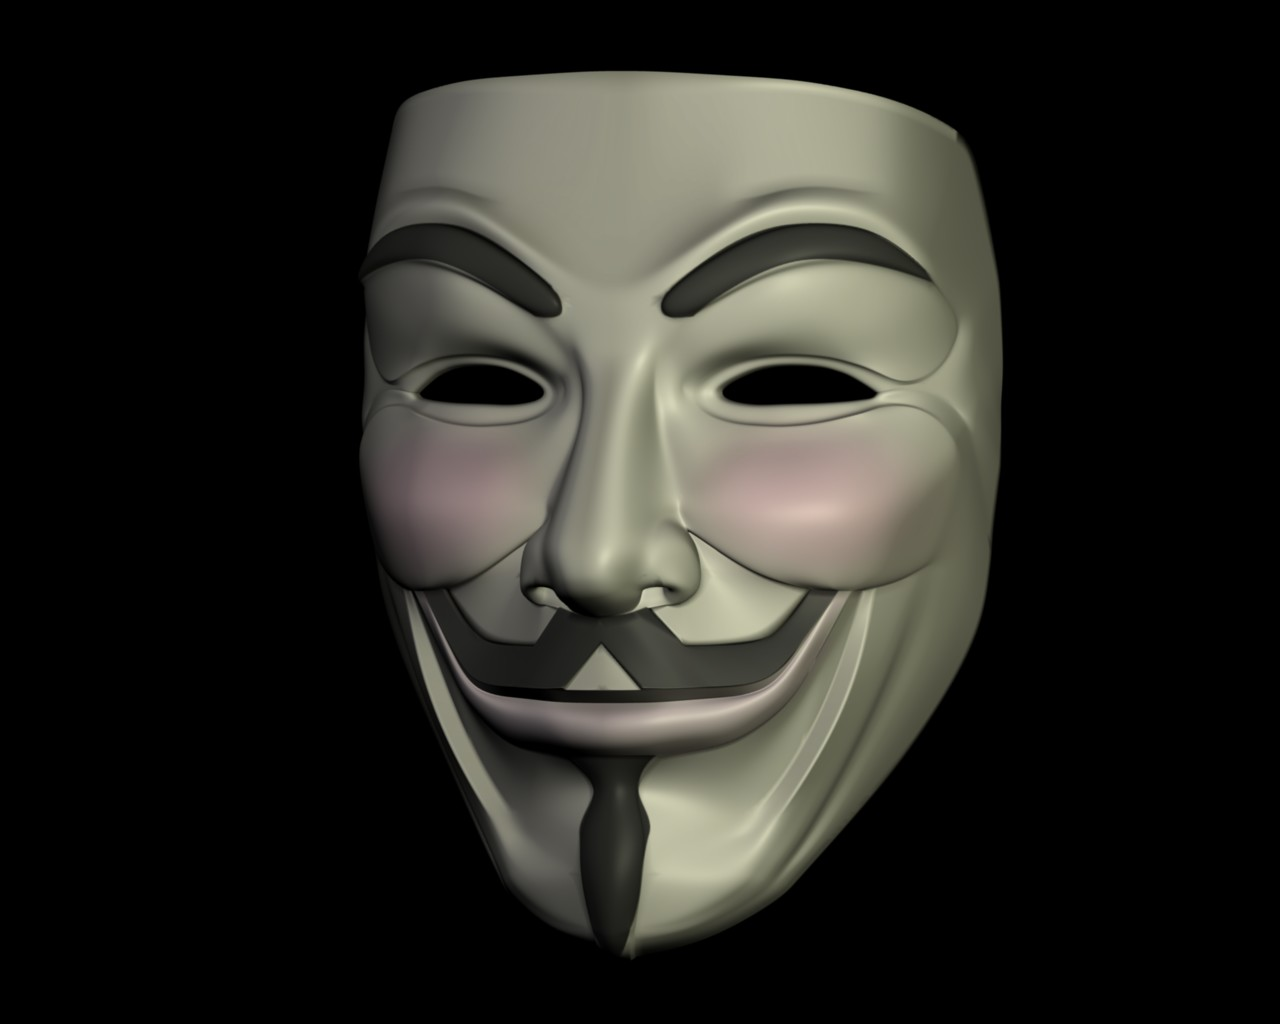 ... Guy Fawkes Mask Render 2 by jtm1997